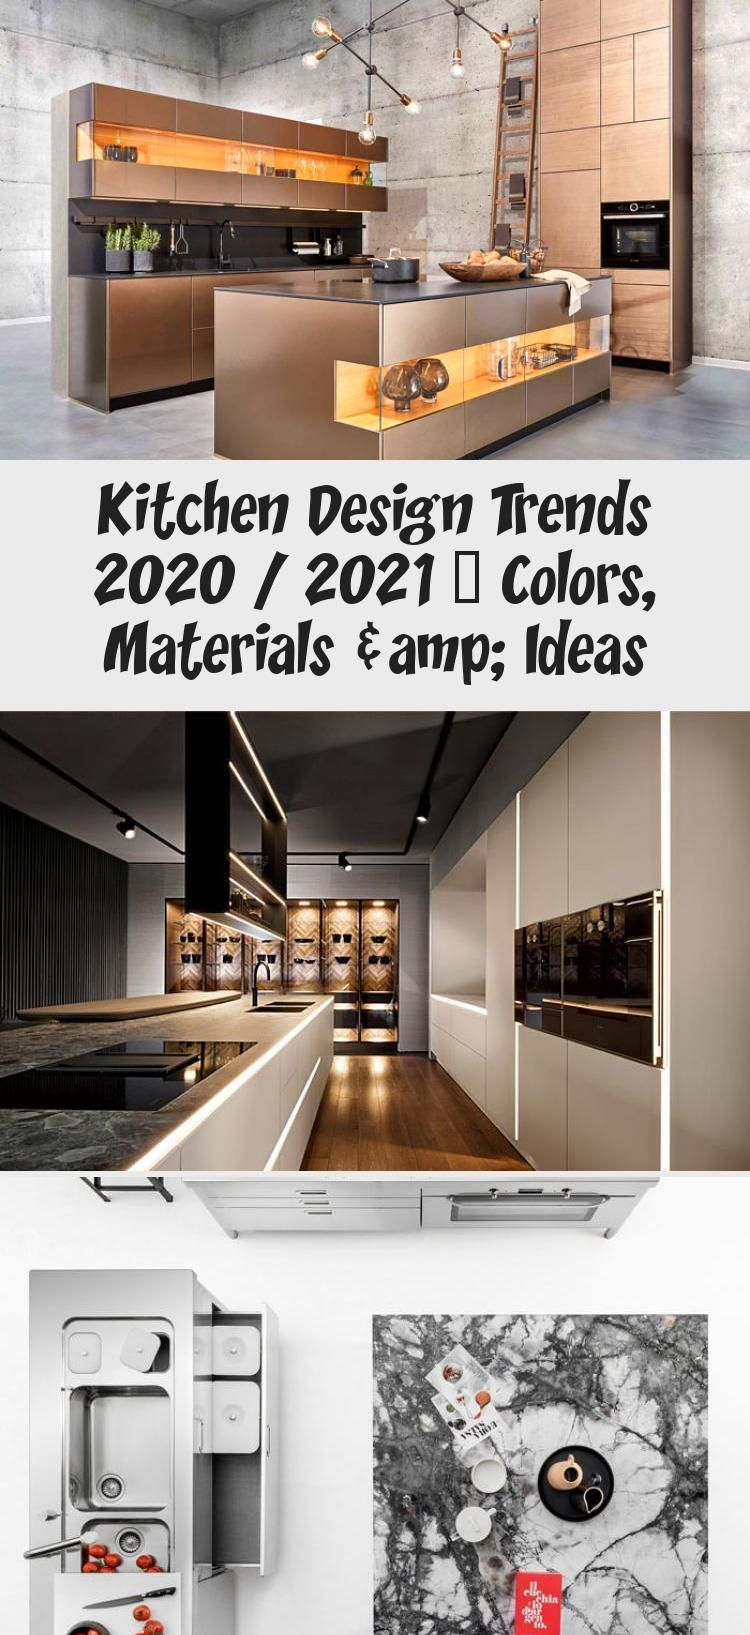 Kitchen Design Trends 2020 2021 Colors Materials Ideas Kitchen Design Trends Kitchen Design Design Trends